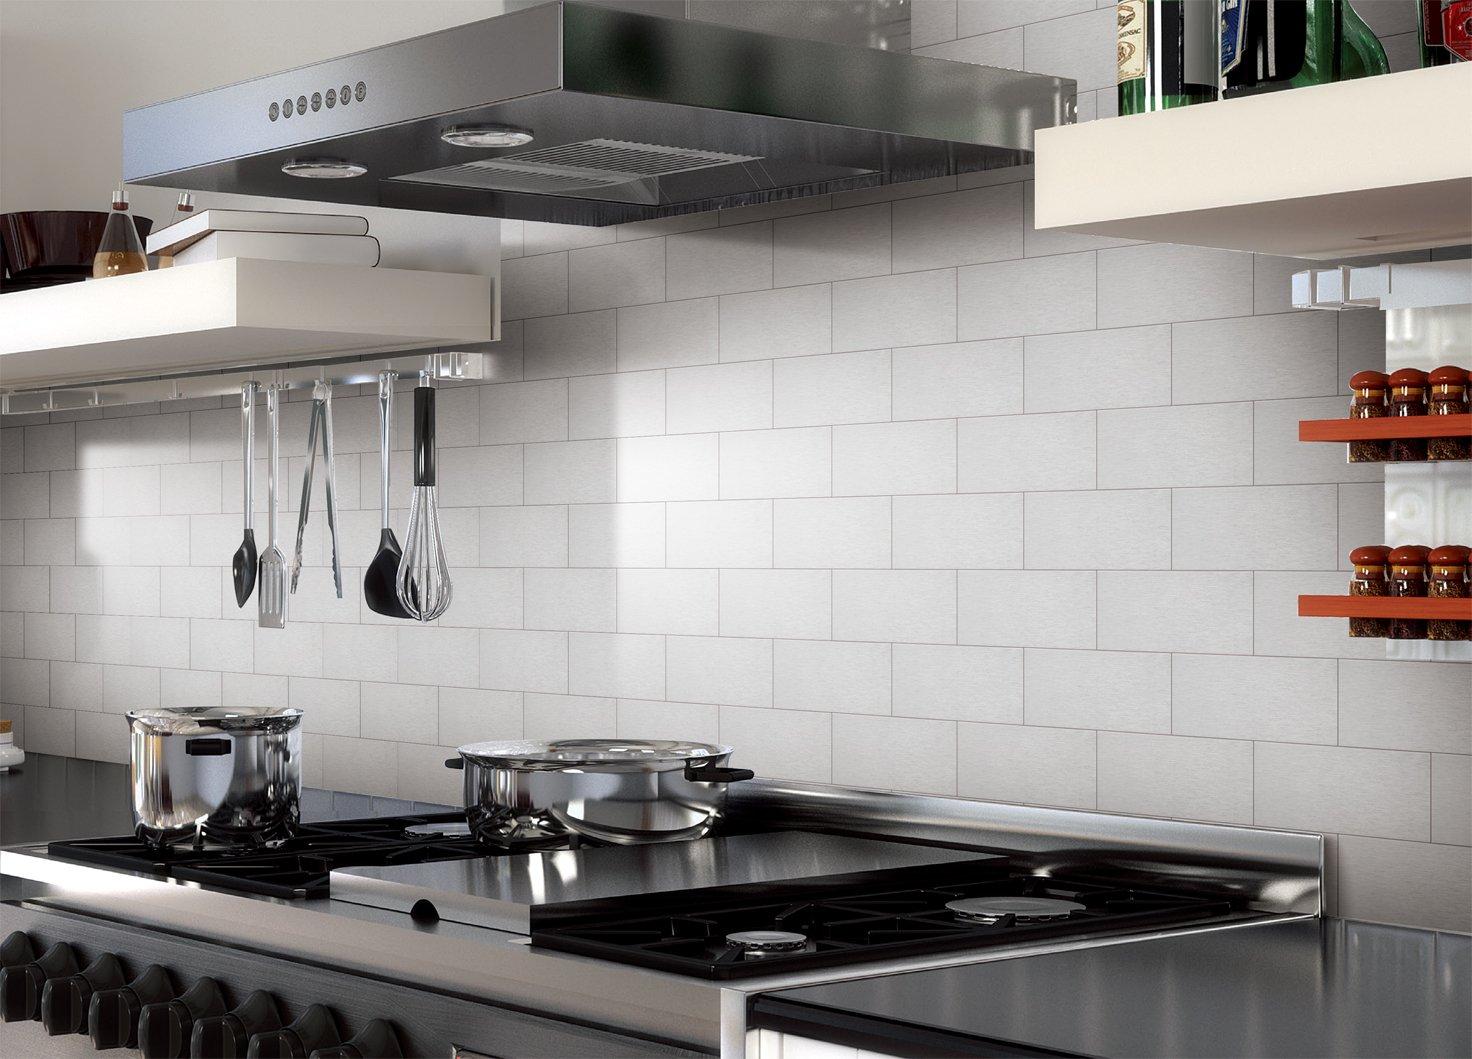 3 x 6 Brushed Champagne Art3d Peel and Stick Backsplash Long Grain Metal Tile for Kitchen and Bathrooms